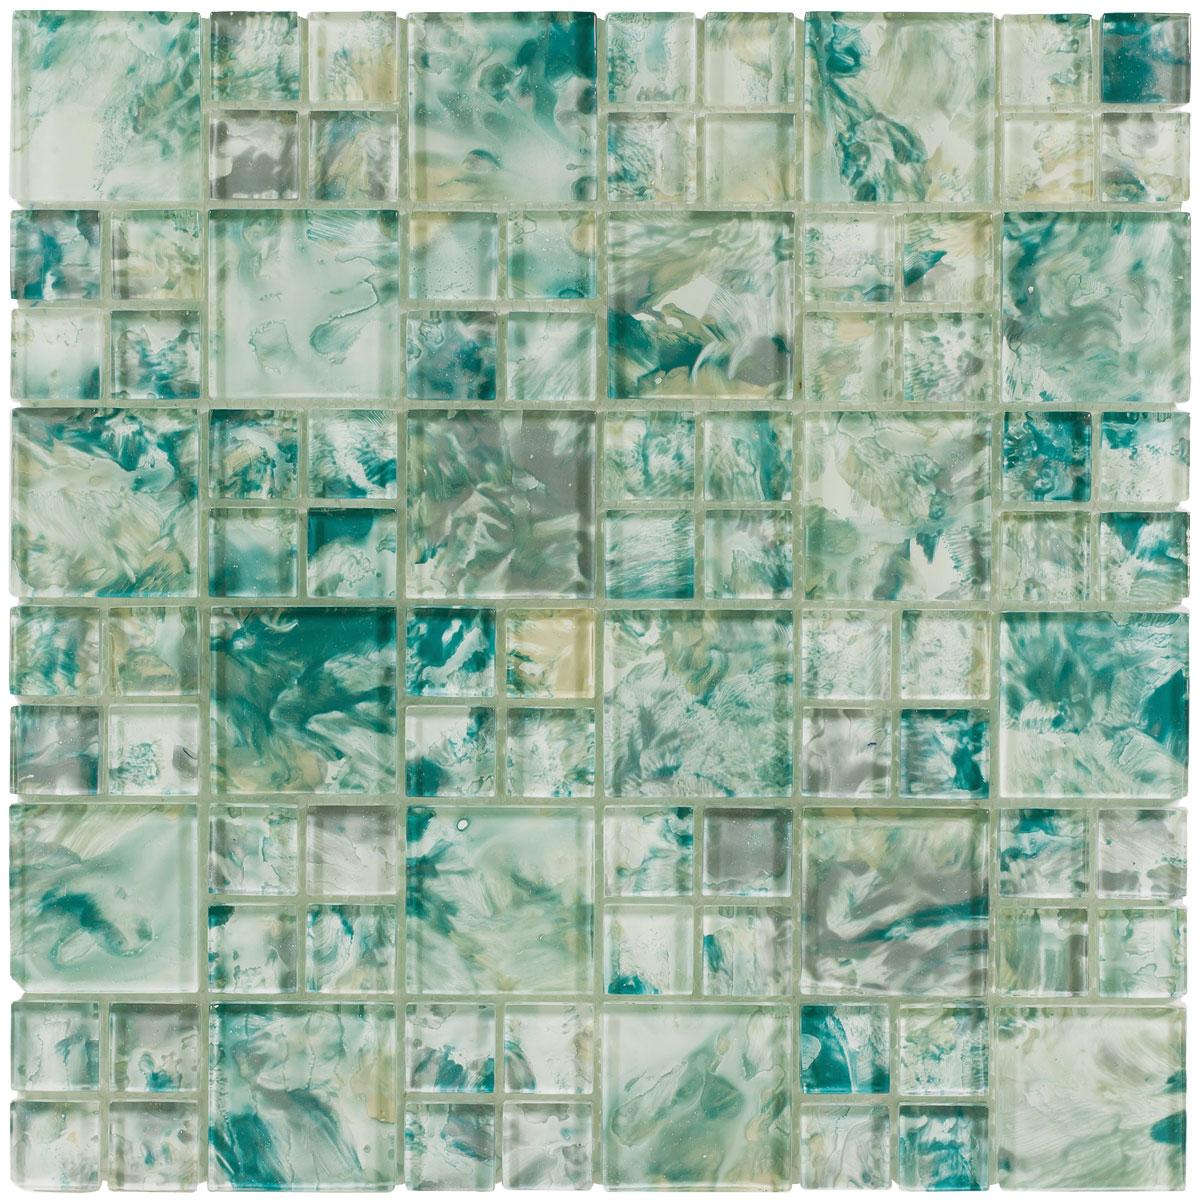 monet tonda sea green glass mosaic tile qdi surfaces. Black Bedroom Furniture Sets. Home Design Ideas